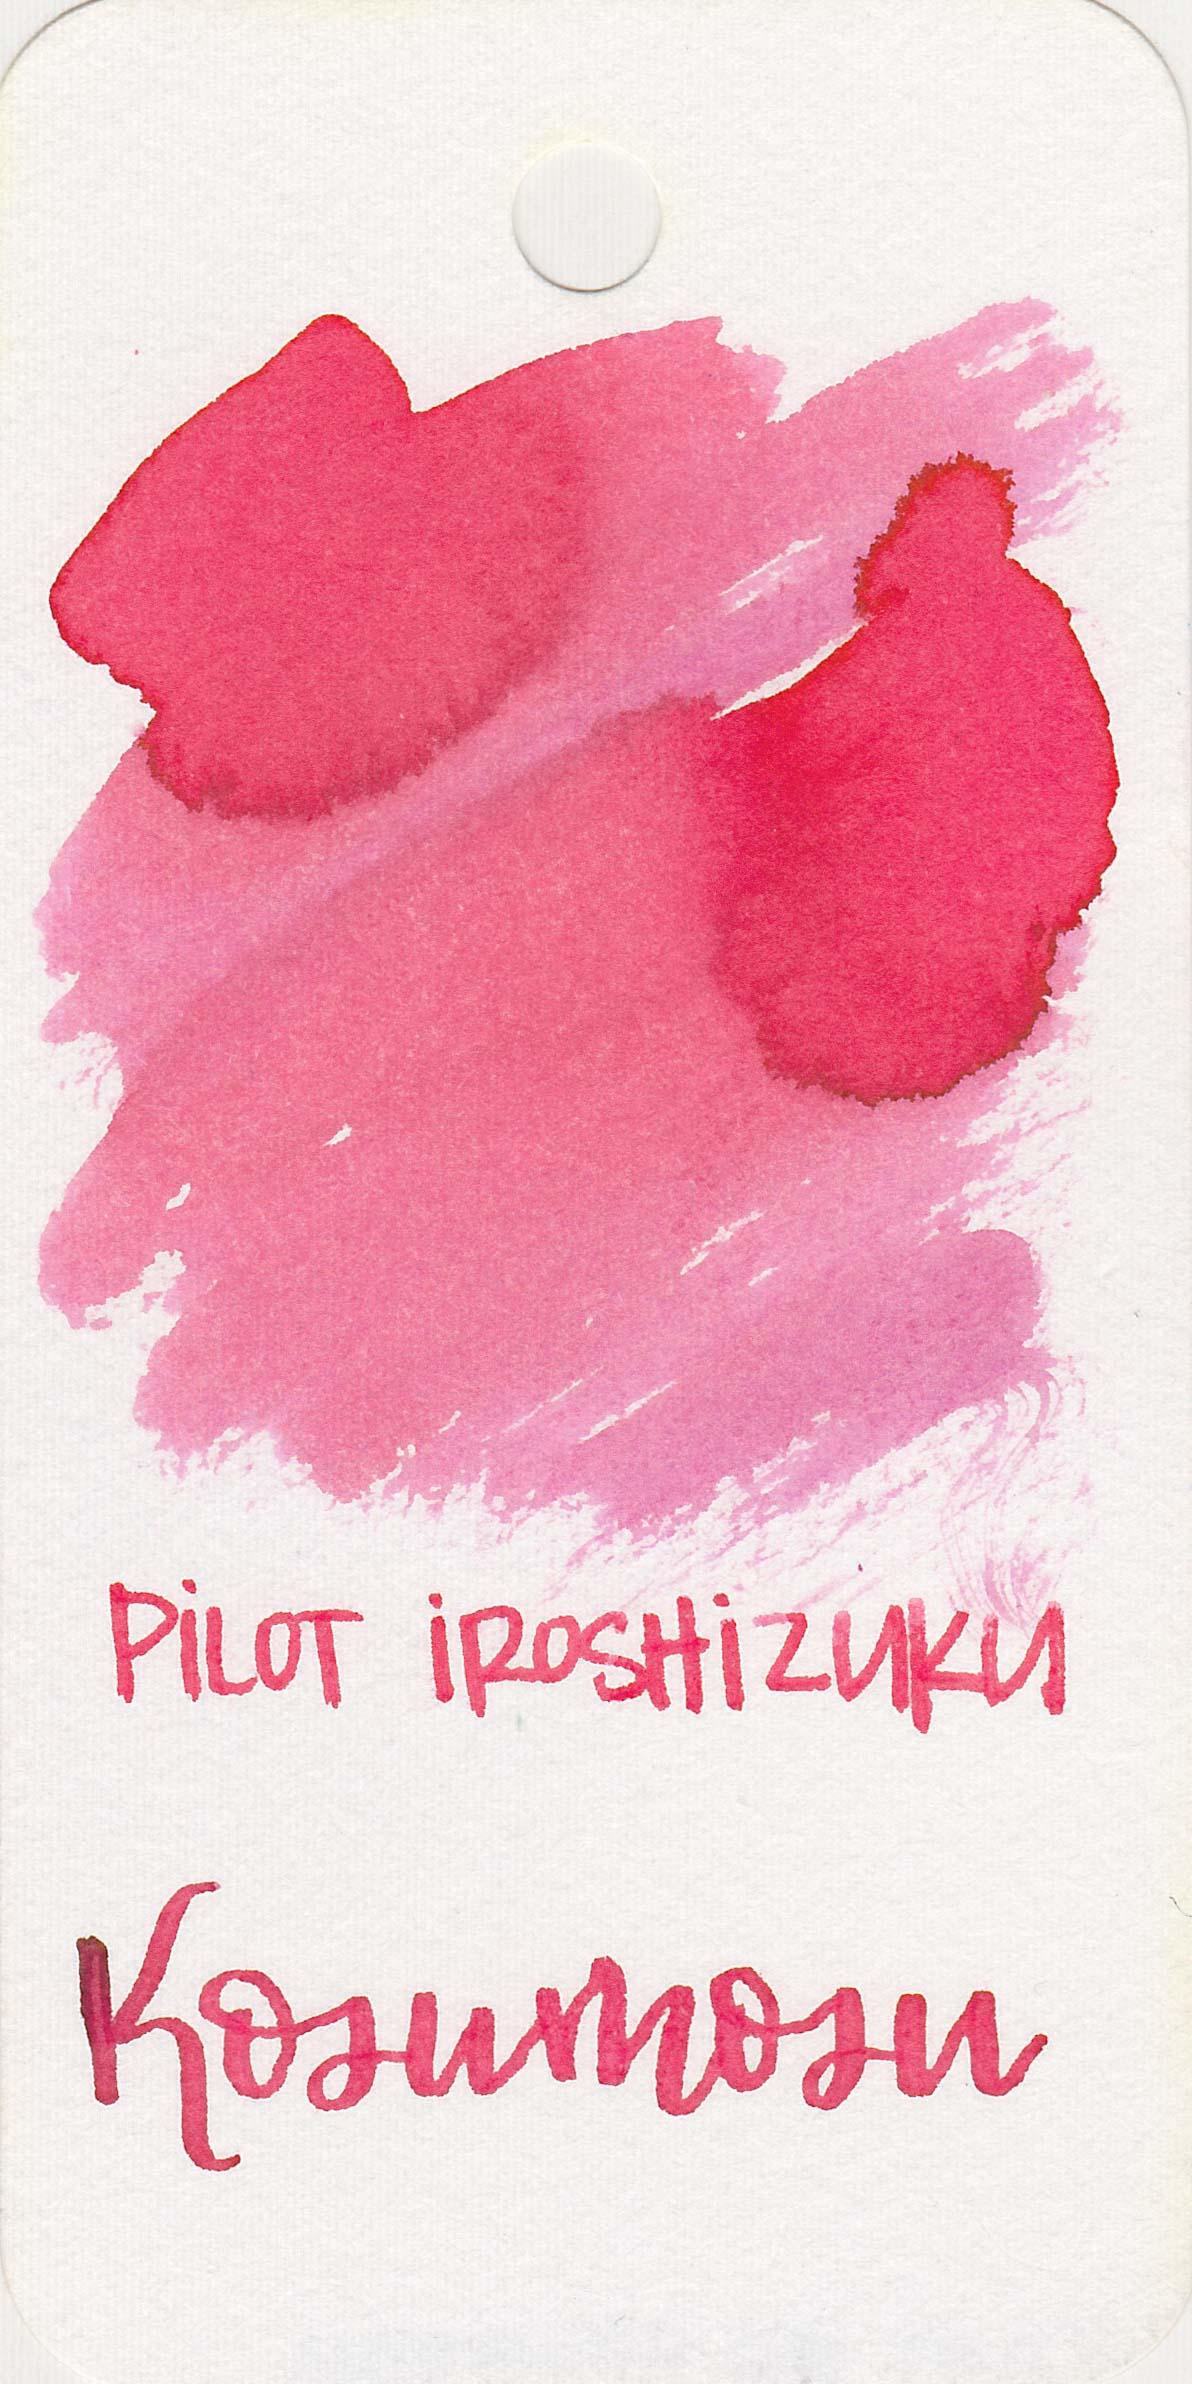 pilotKosumosu-1.jpg